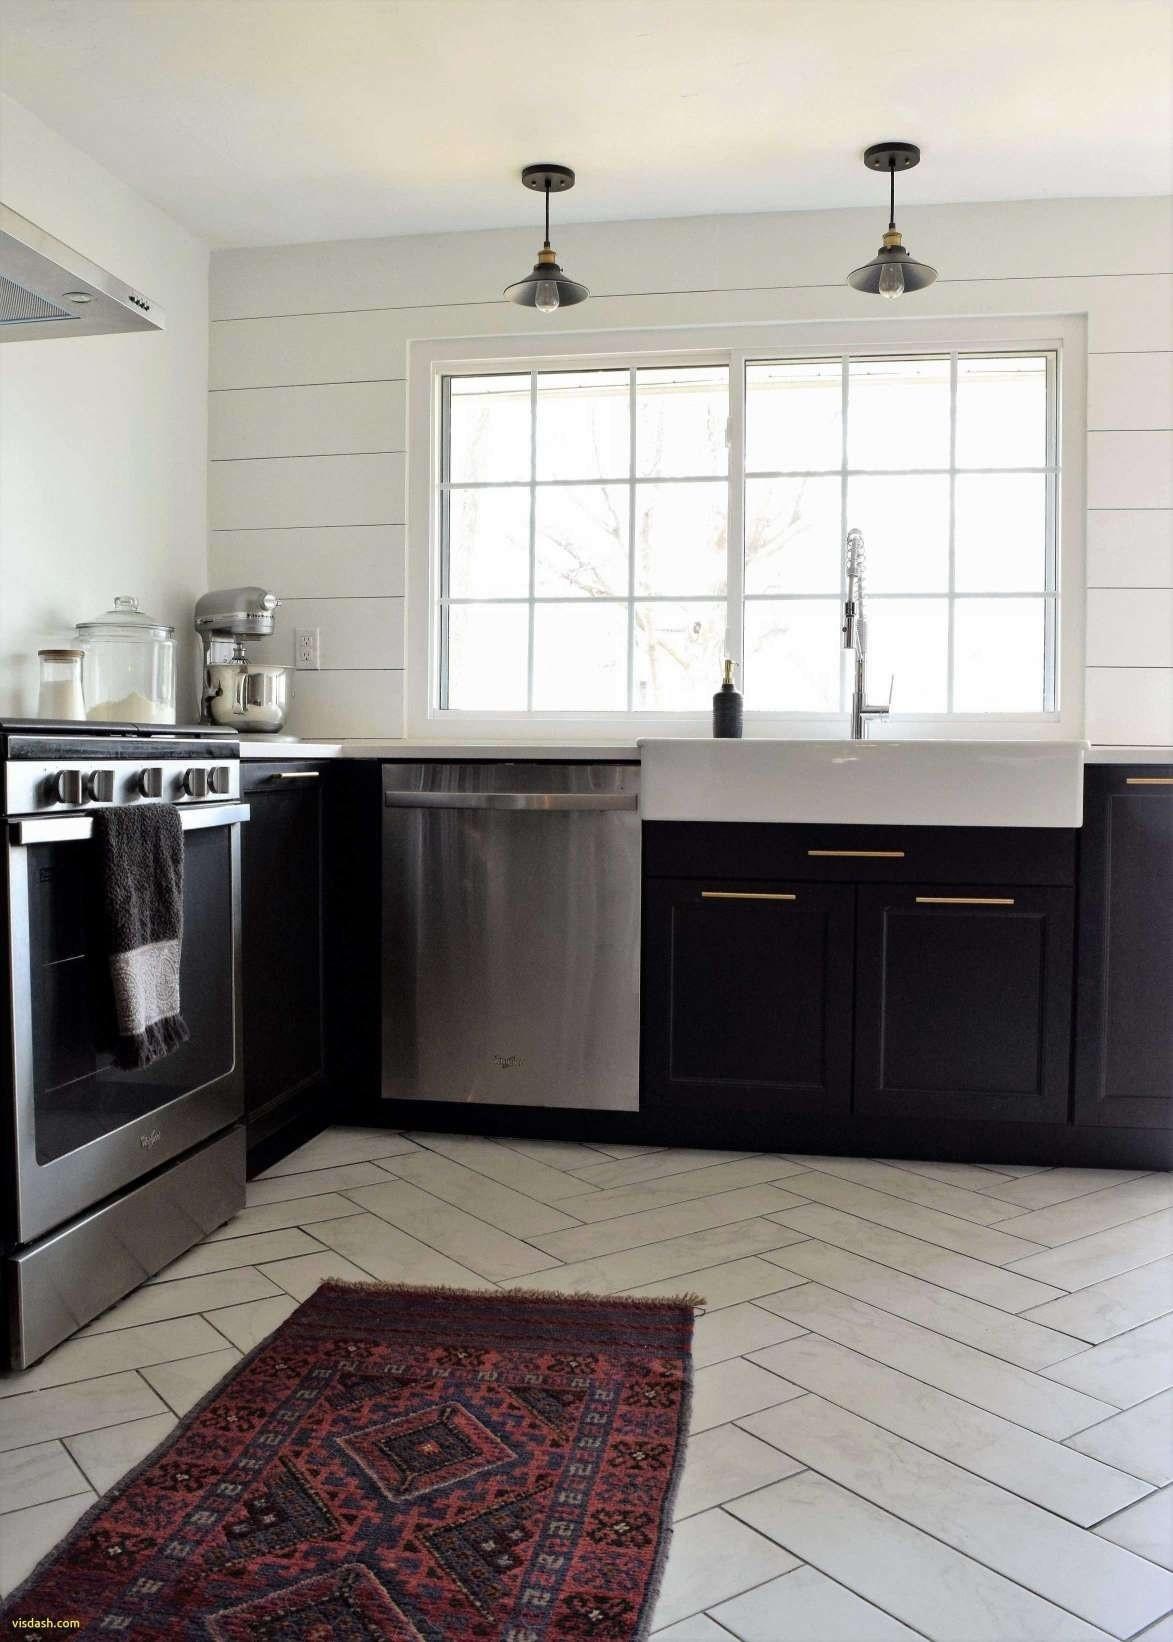 hardwood on concrete basement floor of white mold on basement floor throughout bathroom mold awesome kitchen remodel designs awesome kitchen design 0d design kitchen for 2018